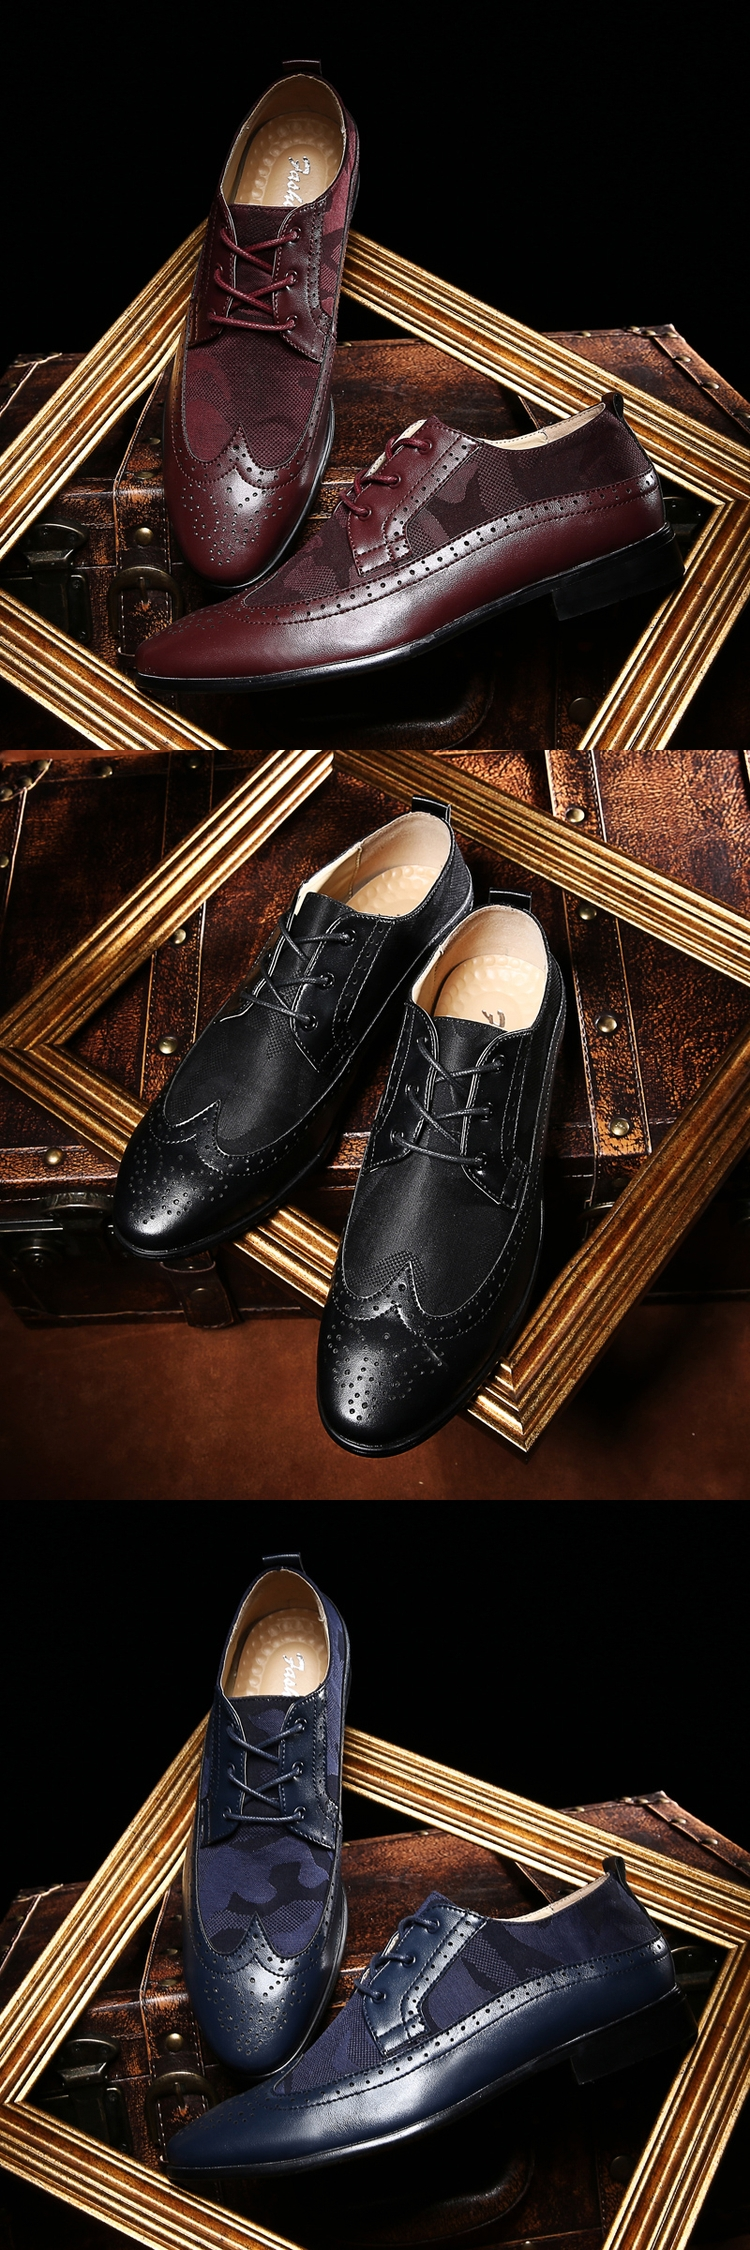 b46e9e83a238b Man Flat Camo Classic Men Dress Shoes Genuine Leather Black Burgundy Red Wingtip  Carved Italian Formal Oxfords Size39-44